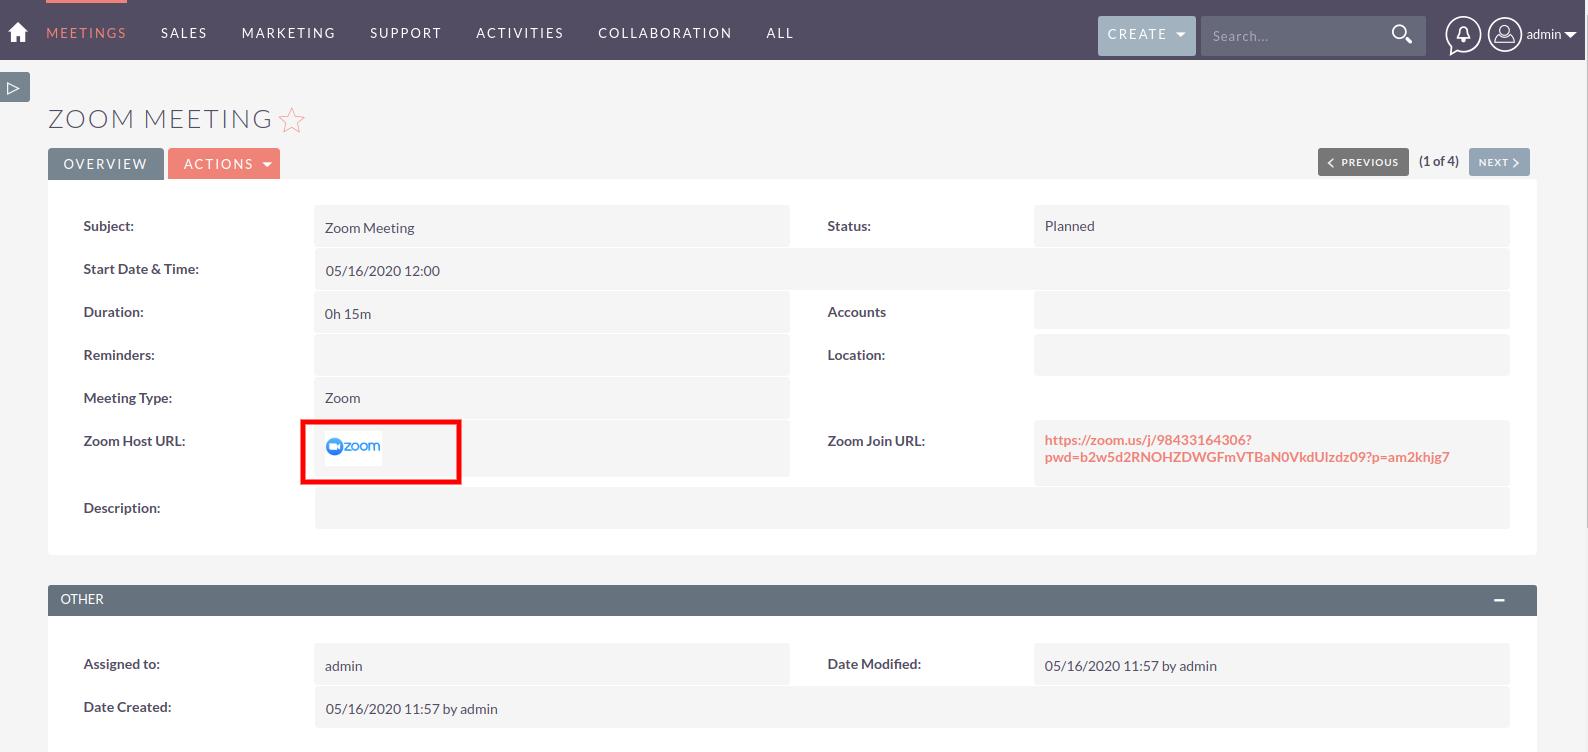 Zoom Integration for SuiteCRM clickable Zoom icon